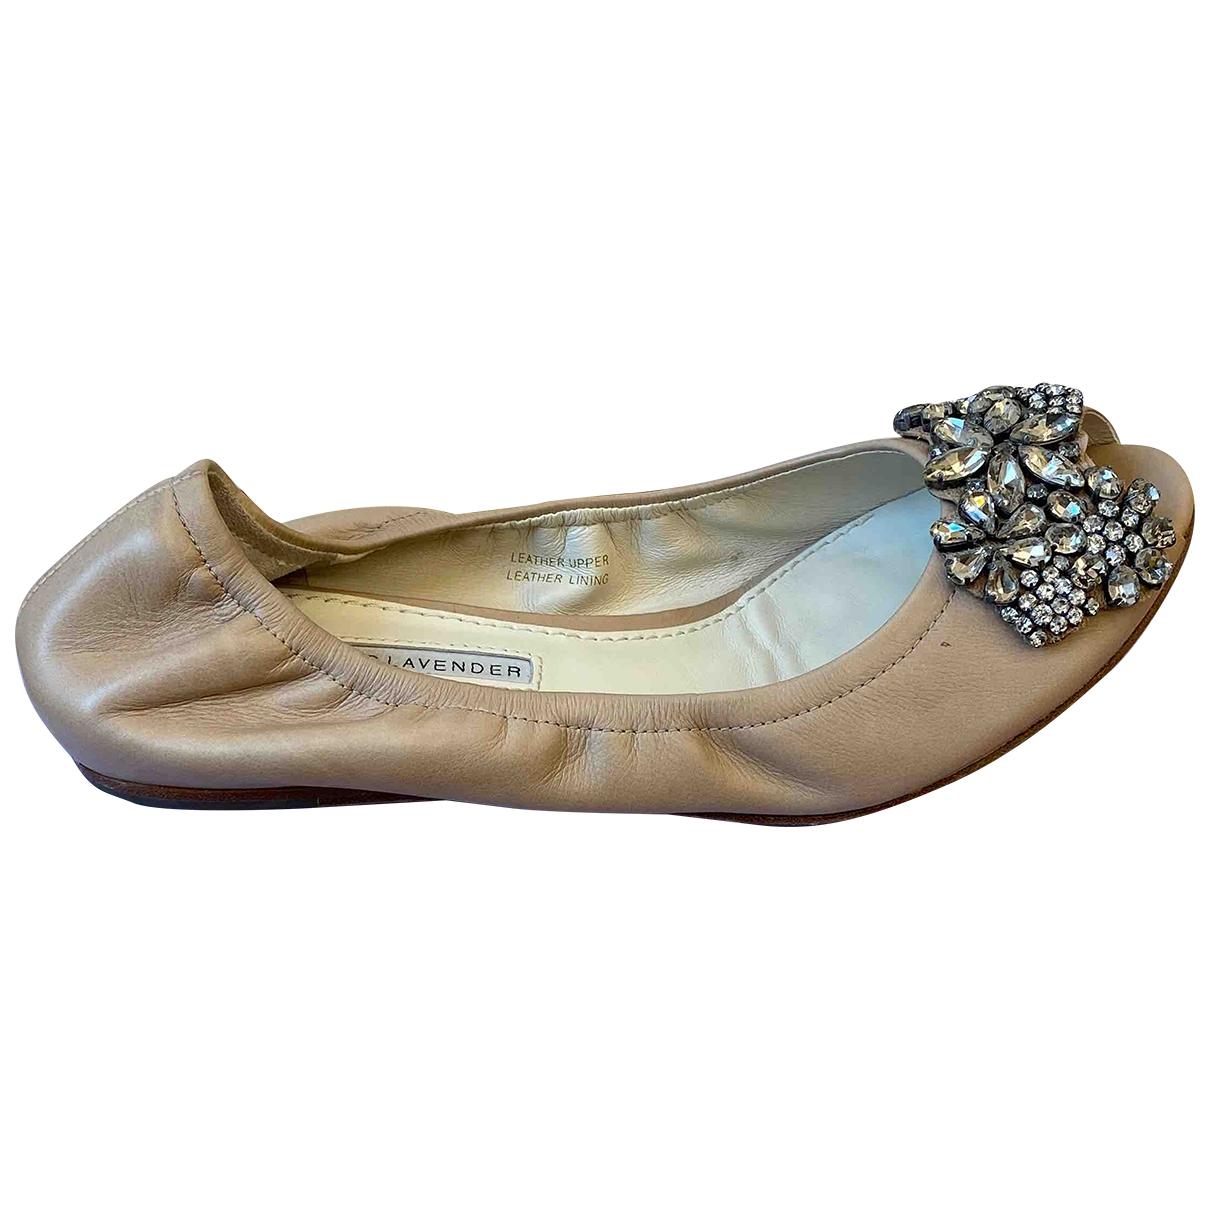 Vera Wang \N Beige Leather Ballet flats for Women 7 US